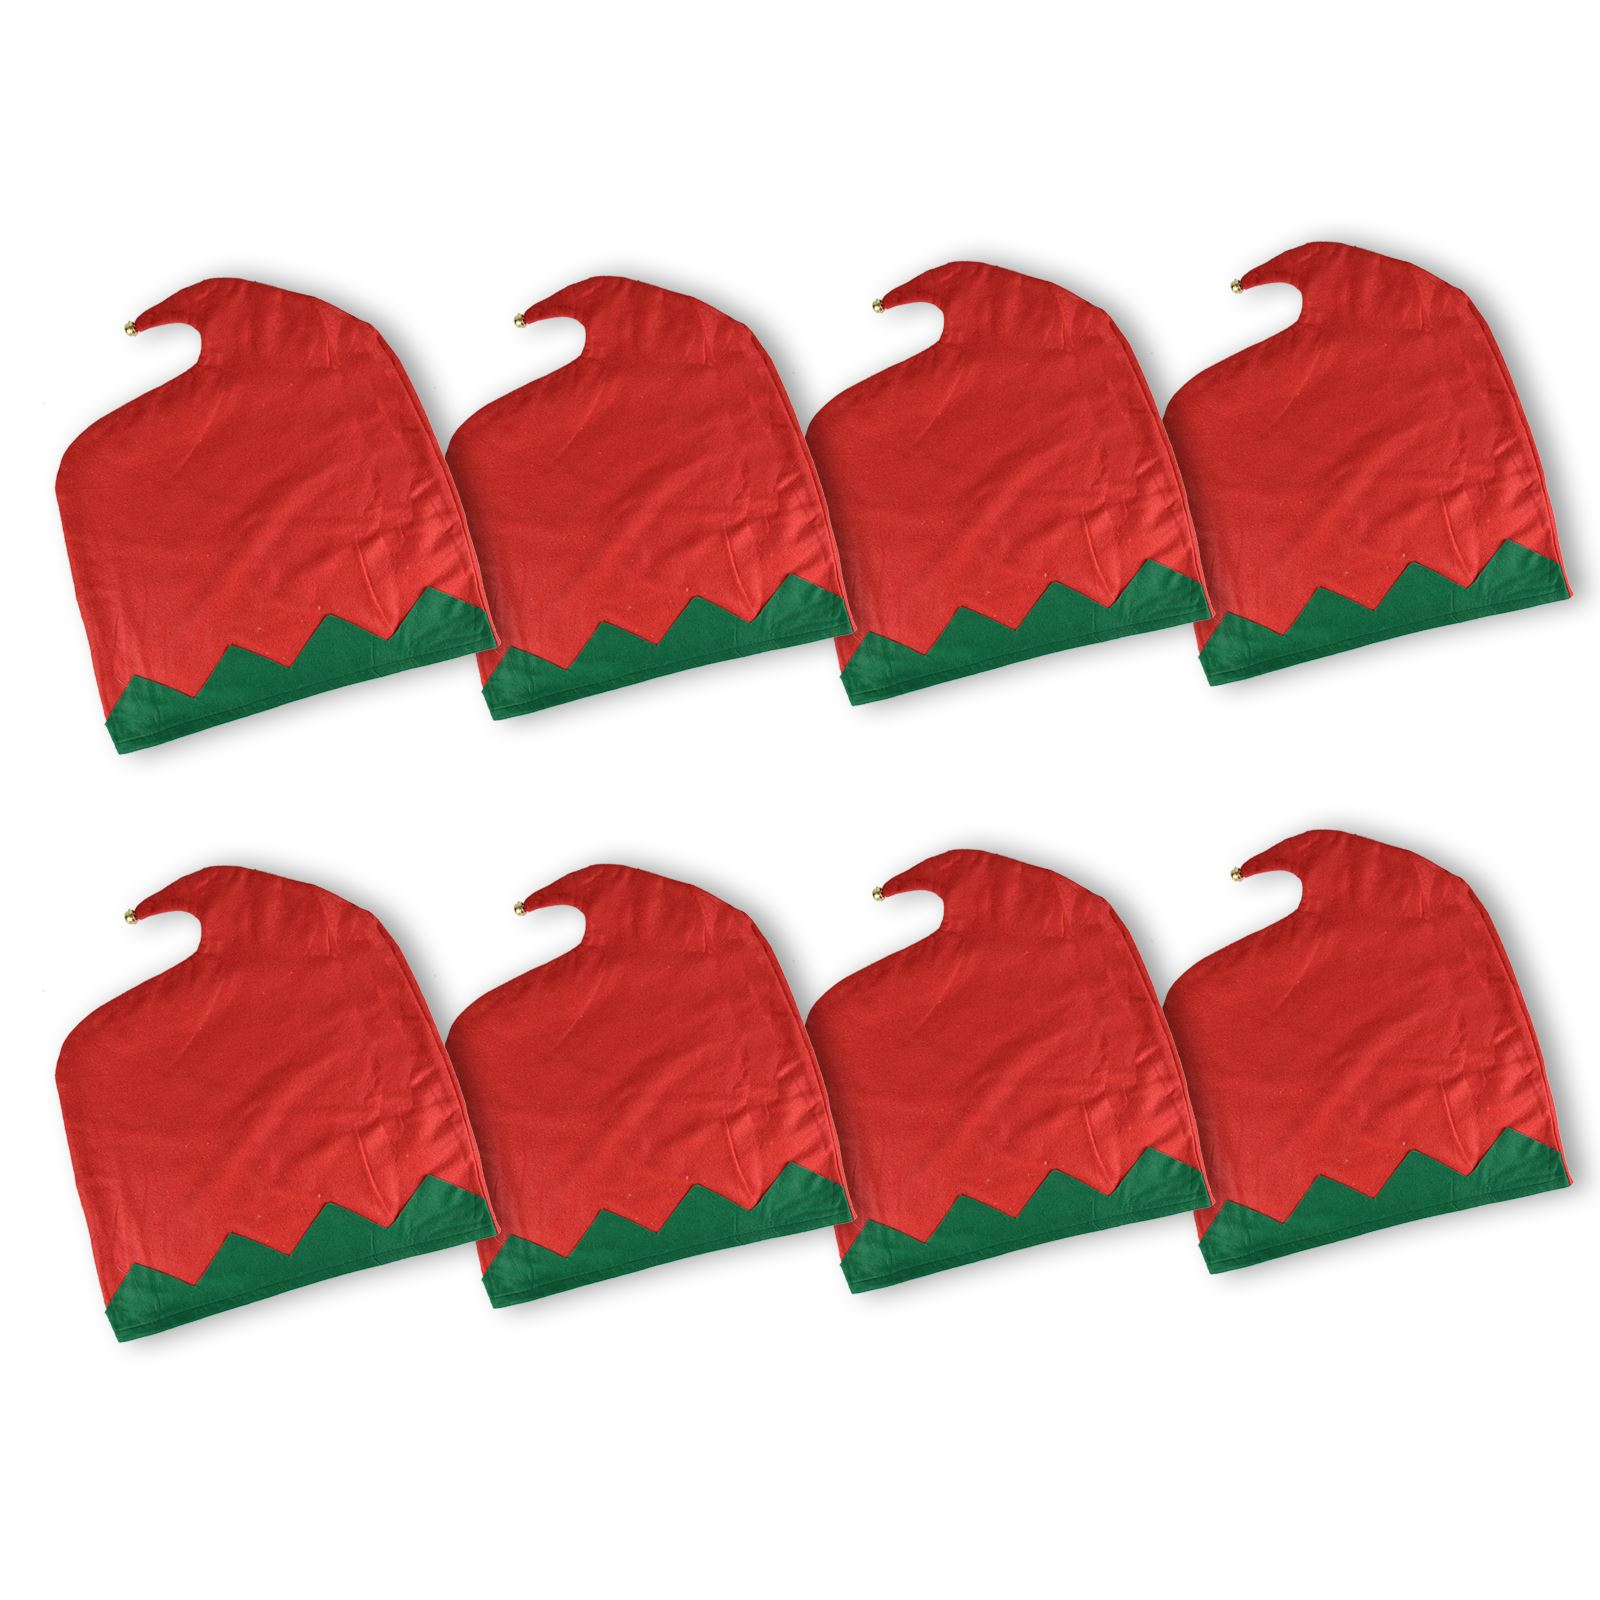 Elf-Sombrero-Navidad-Comedor-Silla-Trasera-Cubierta-Jingle-Bells-Decoracion-Fiesta-De-Navidad miniatura 5